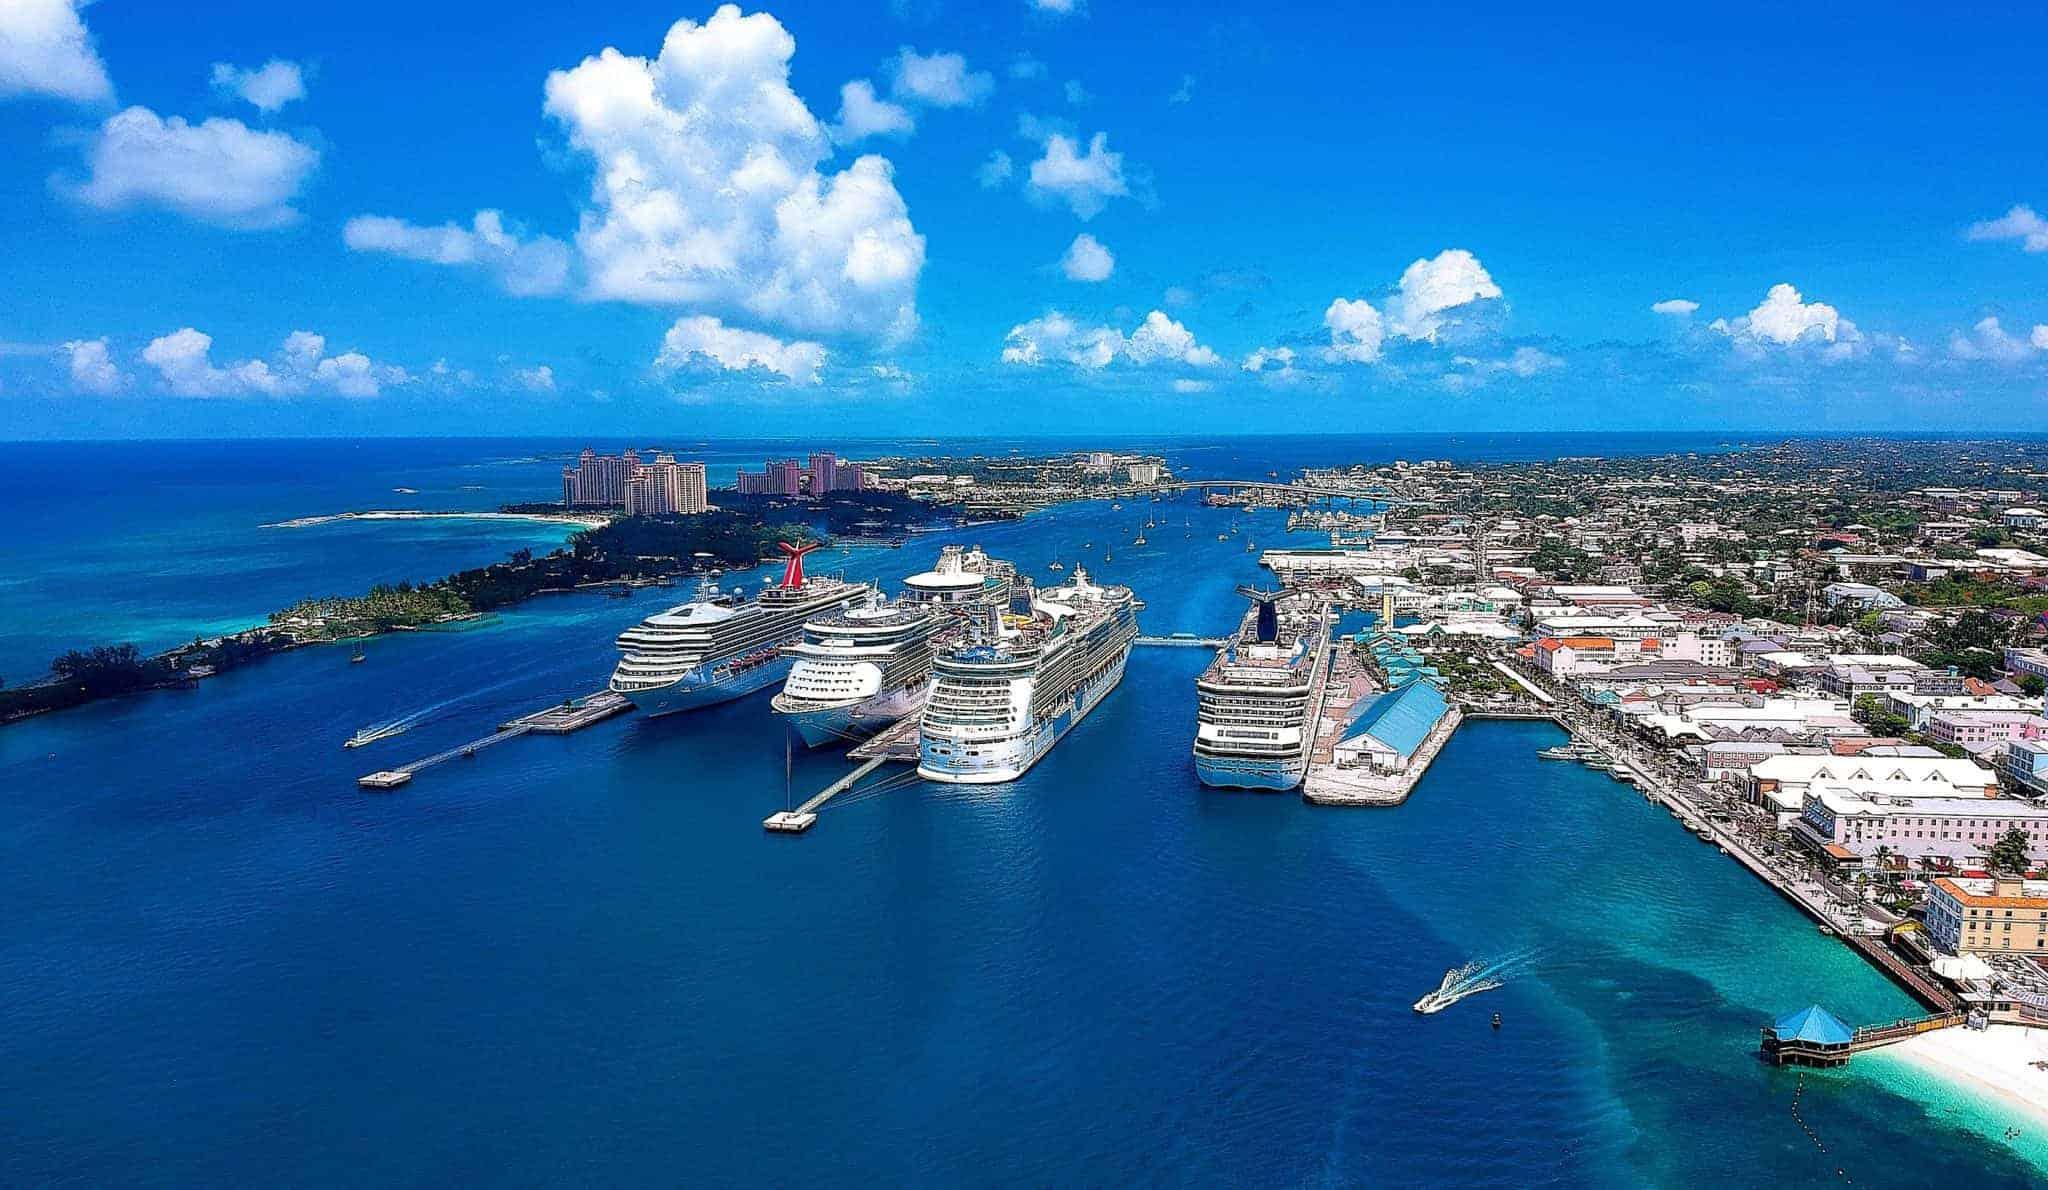 drone nassau bahamas cruise ships